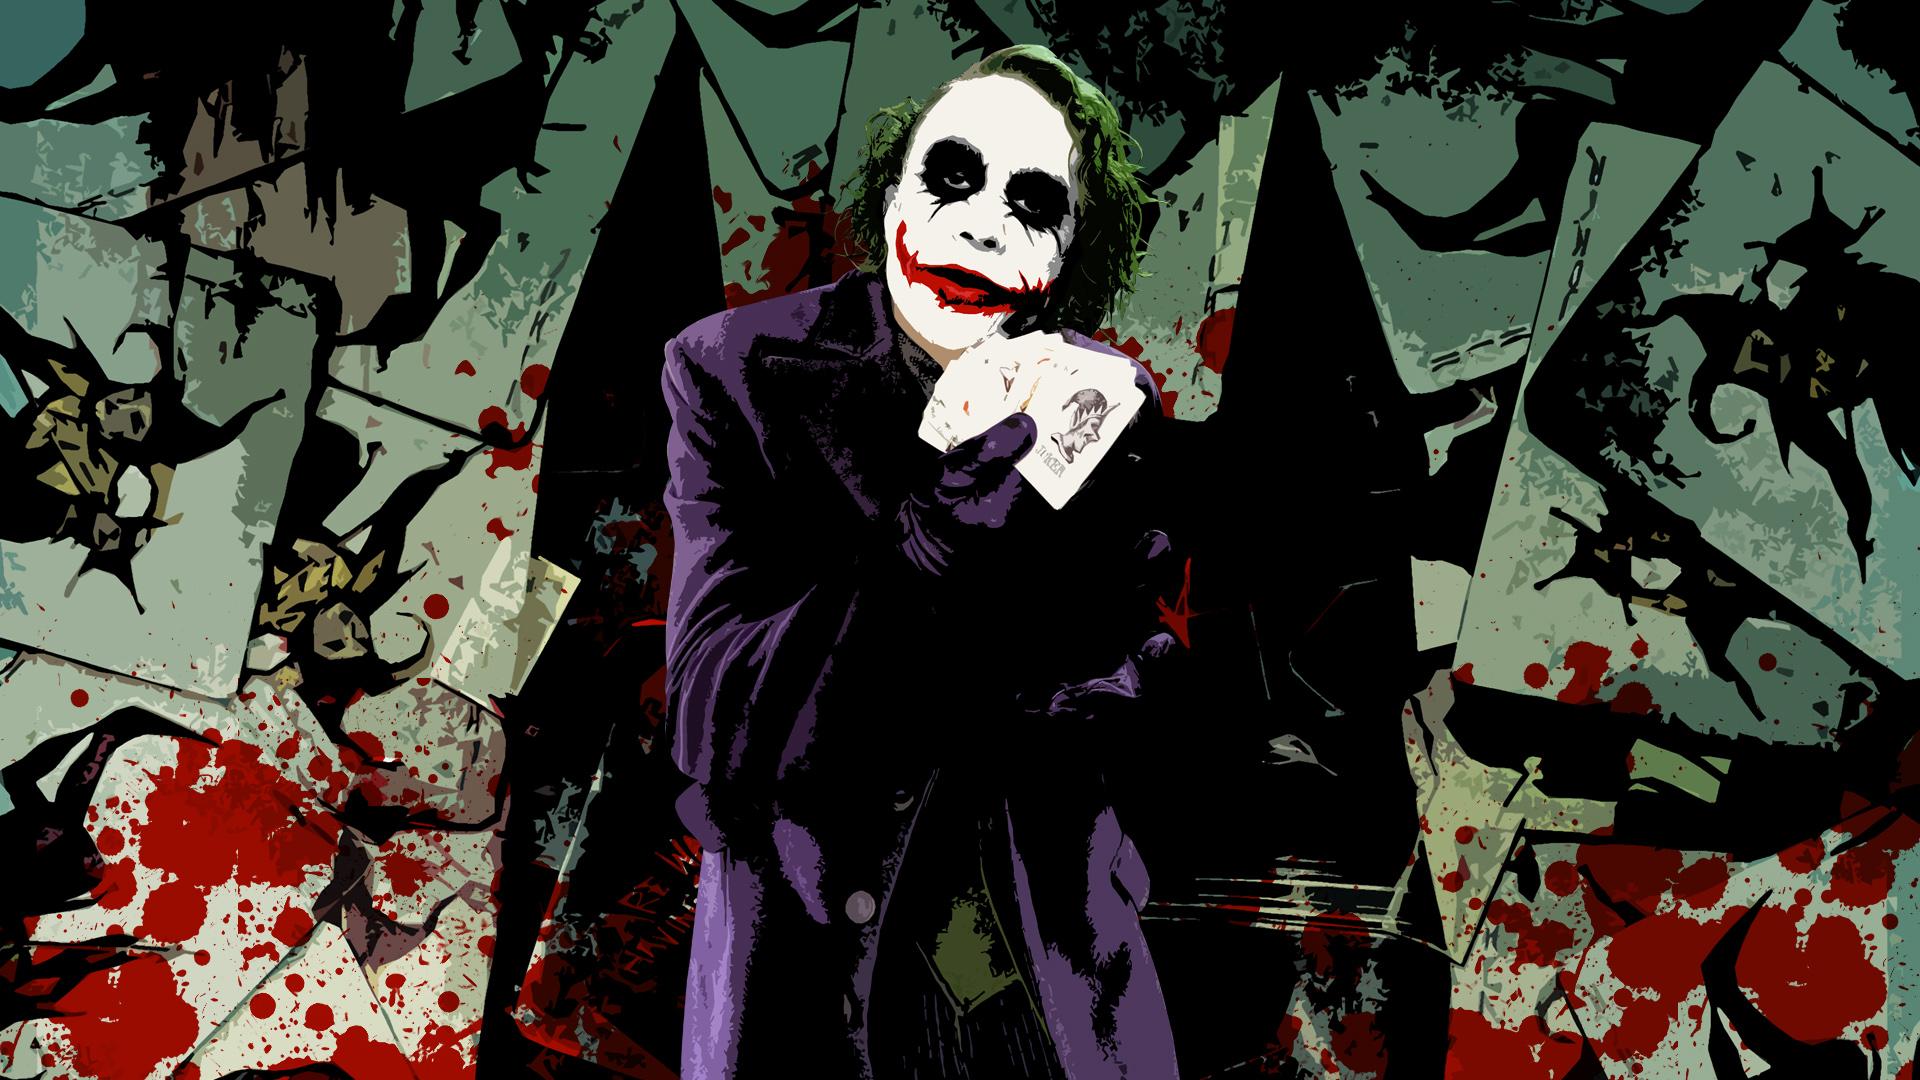 de Batman el caballero oscuro Blog Archive Imgenes de Joker 1920x1080